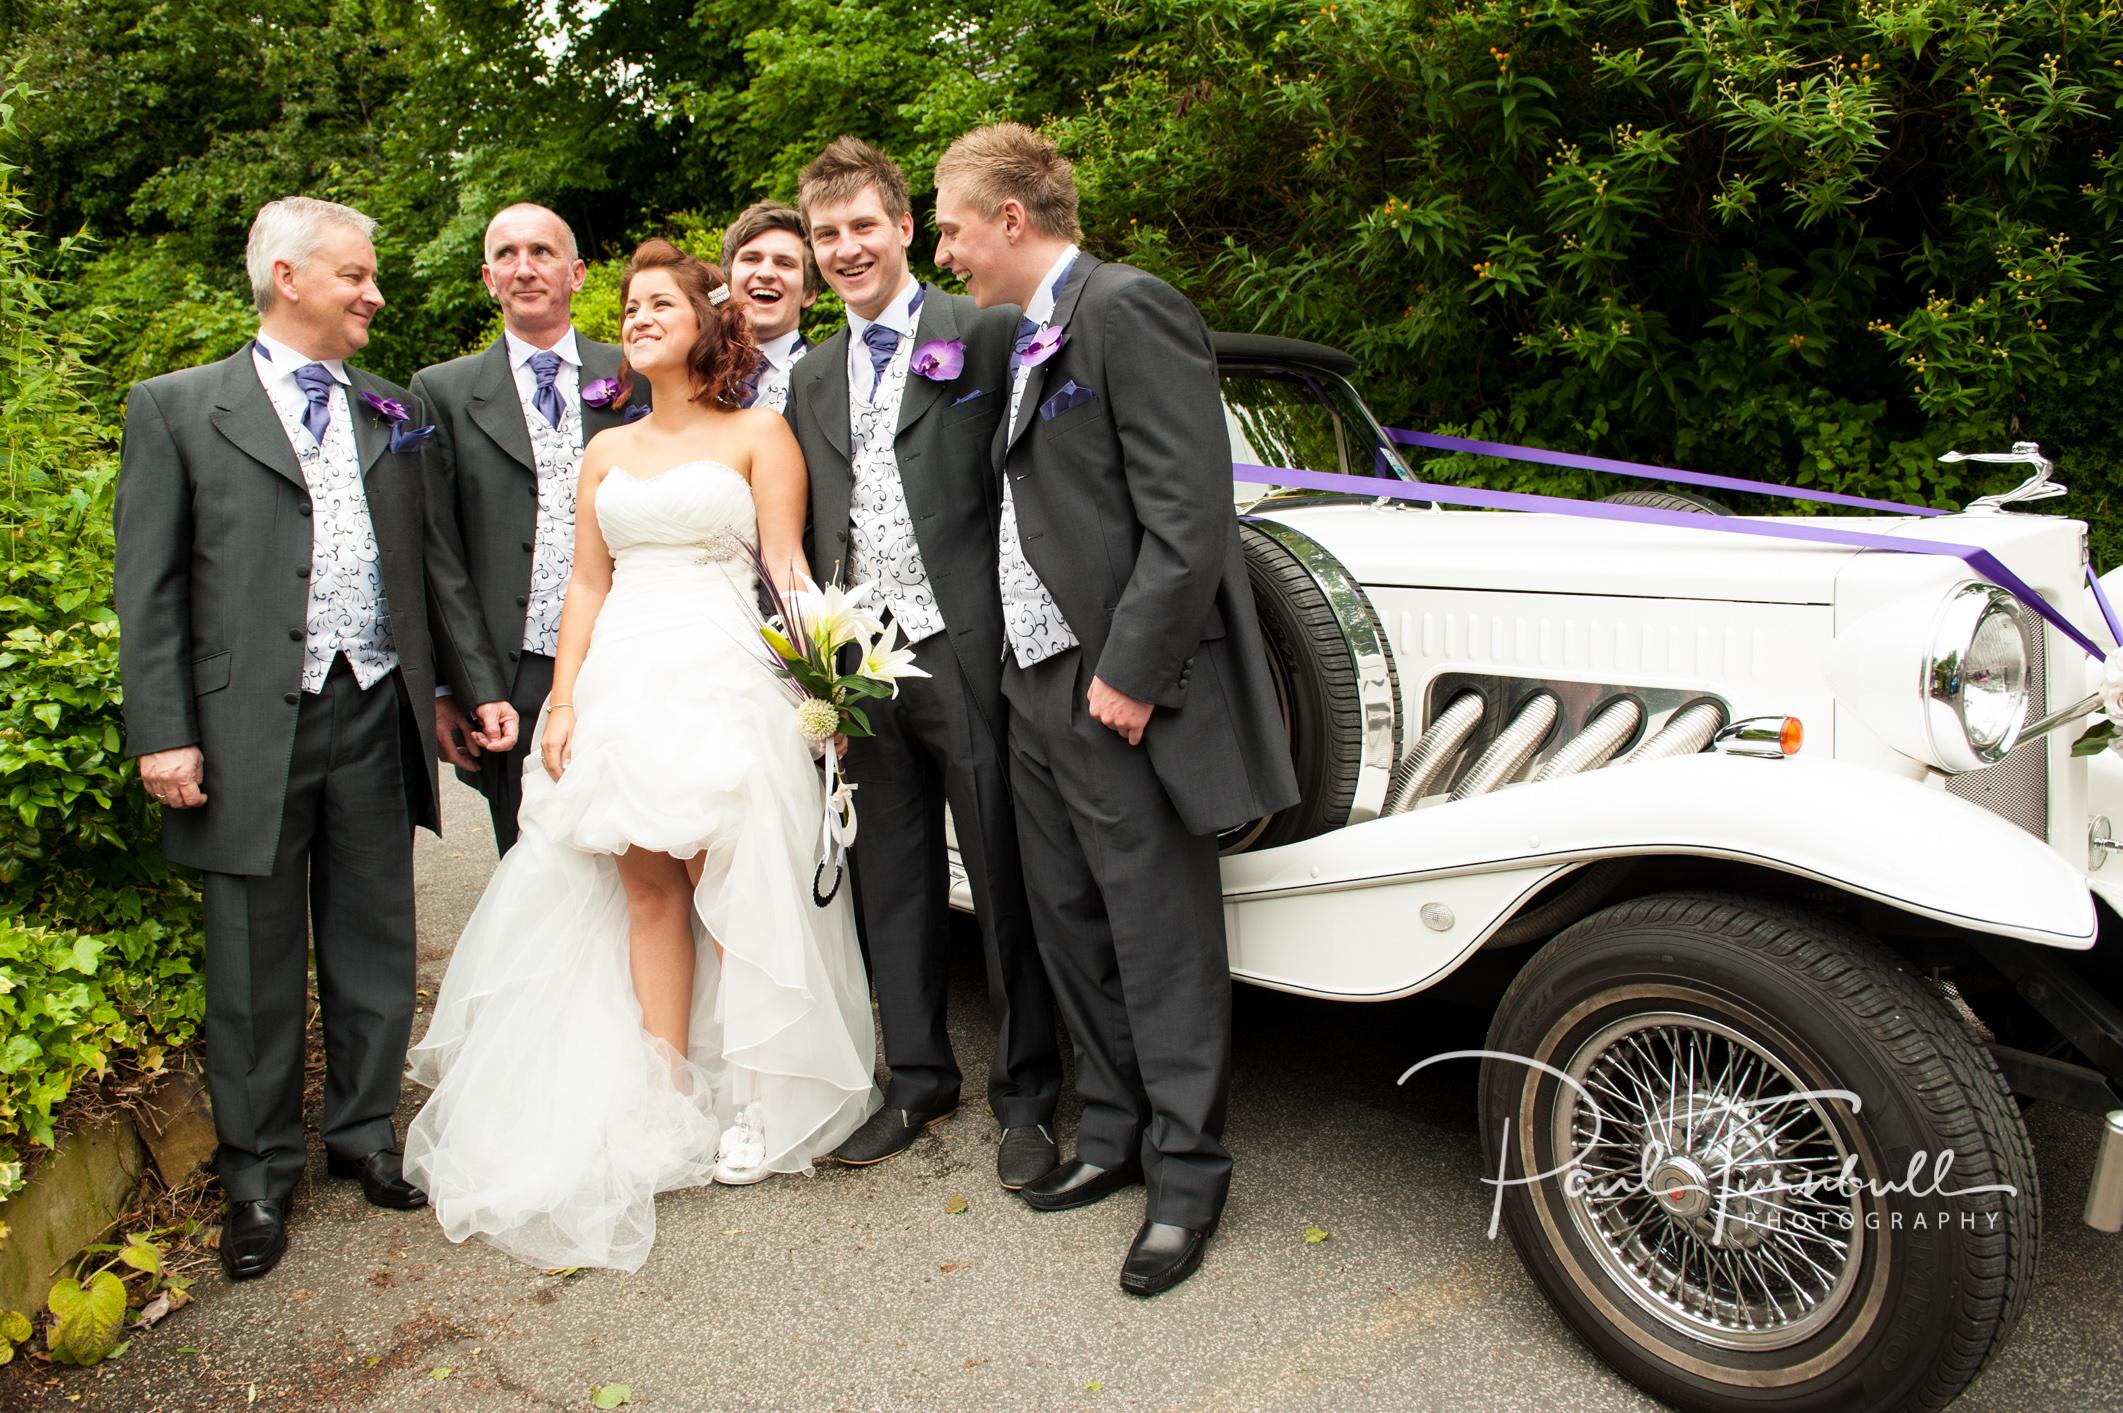 wedding-photography-healds-hall-liversedge-yorkshire-066.jpg